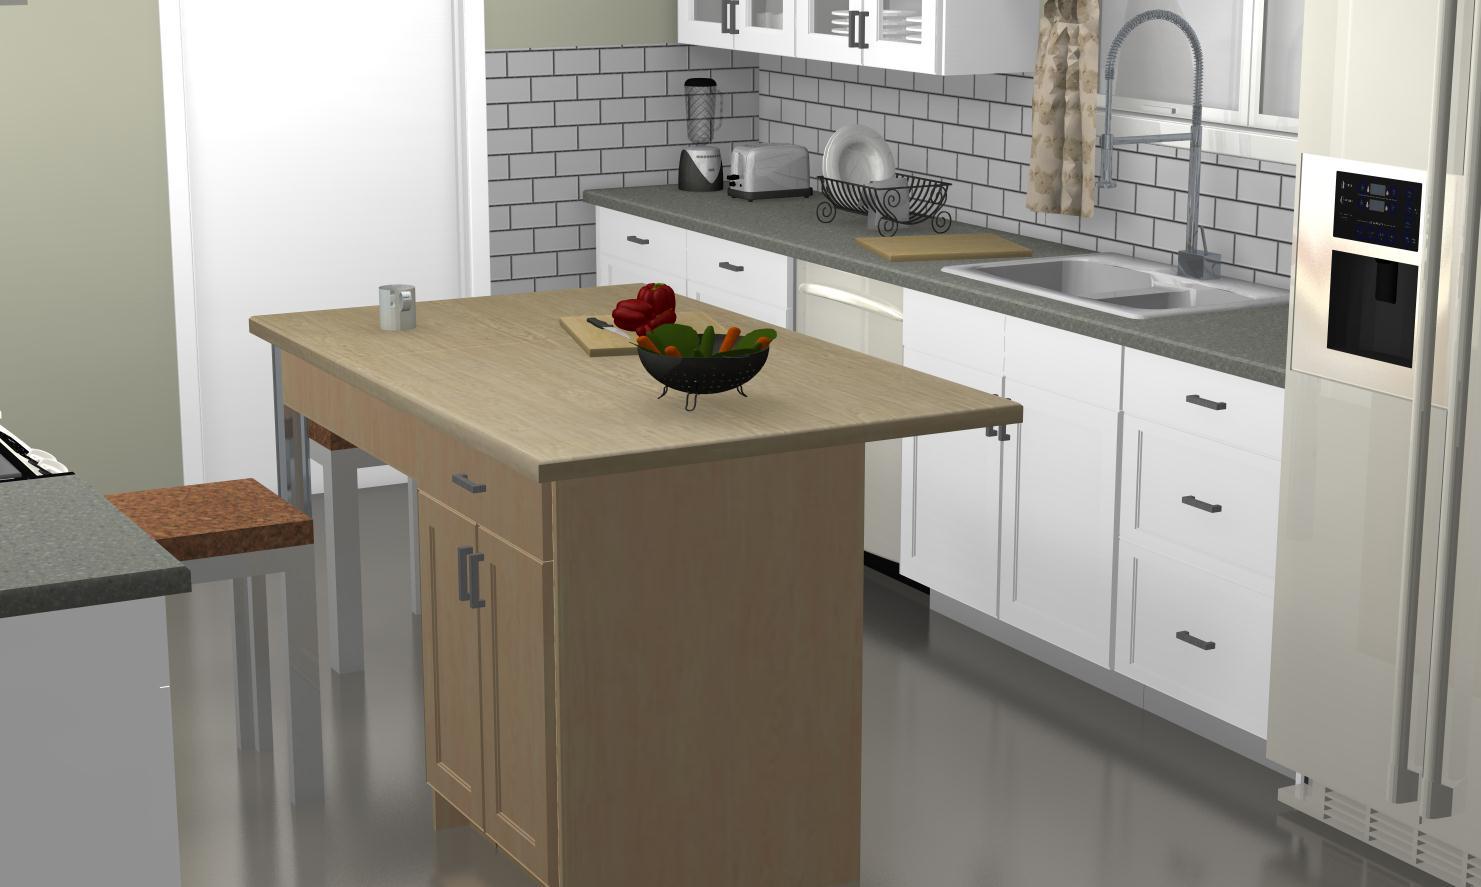 kitchen faucet with handspray boos block island ikdo | the ikea design online blog